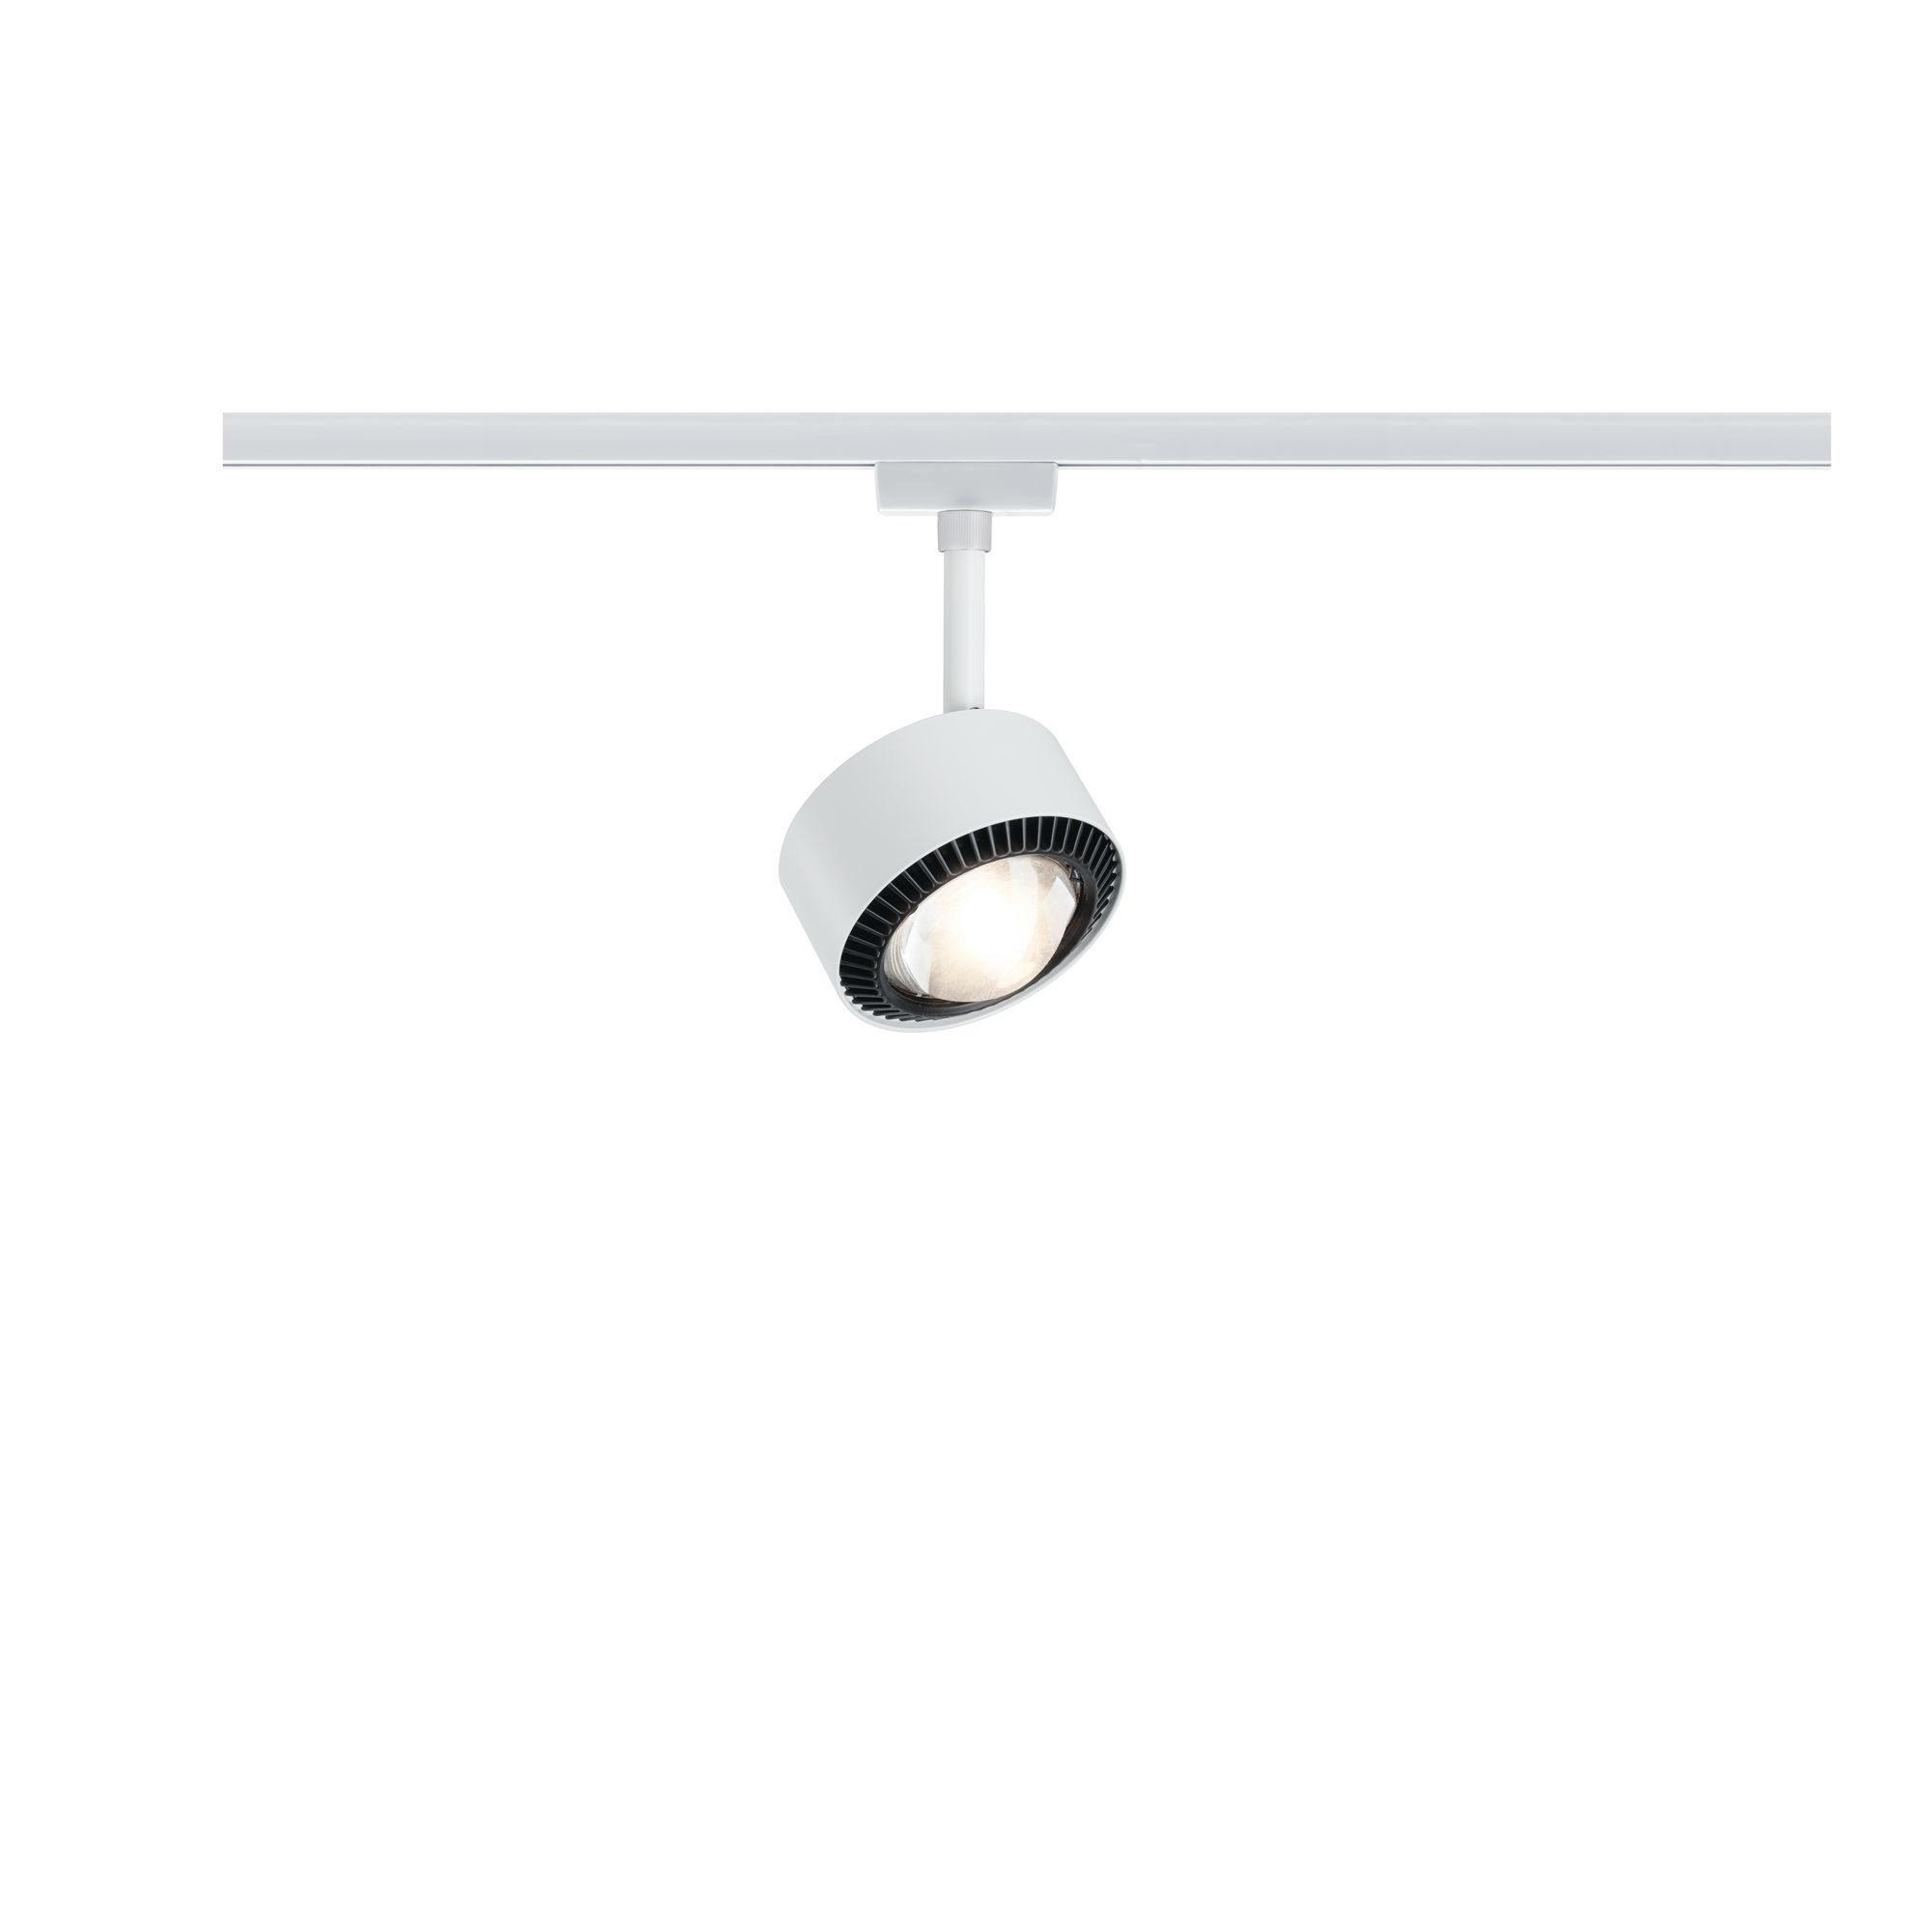 Paulmann URail LED Spot Aldan II 1x8W Weiß#Schwarz 2.700K dimmbar